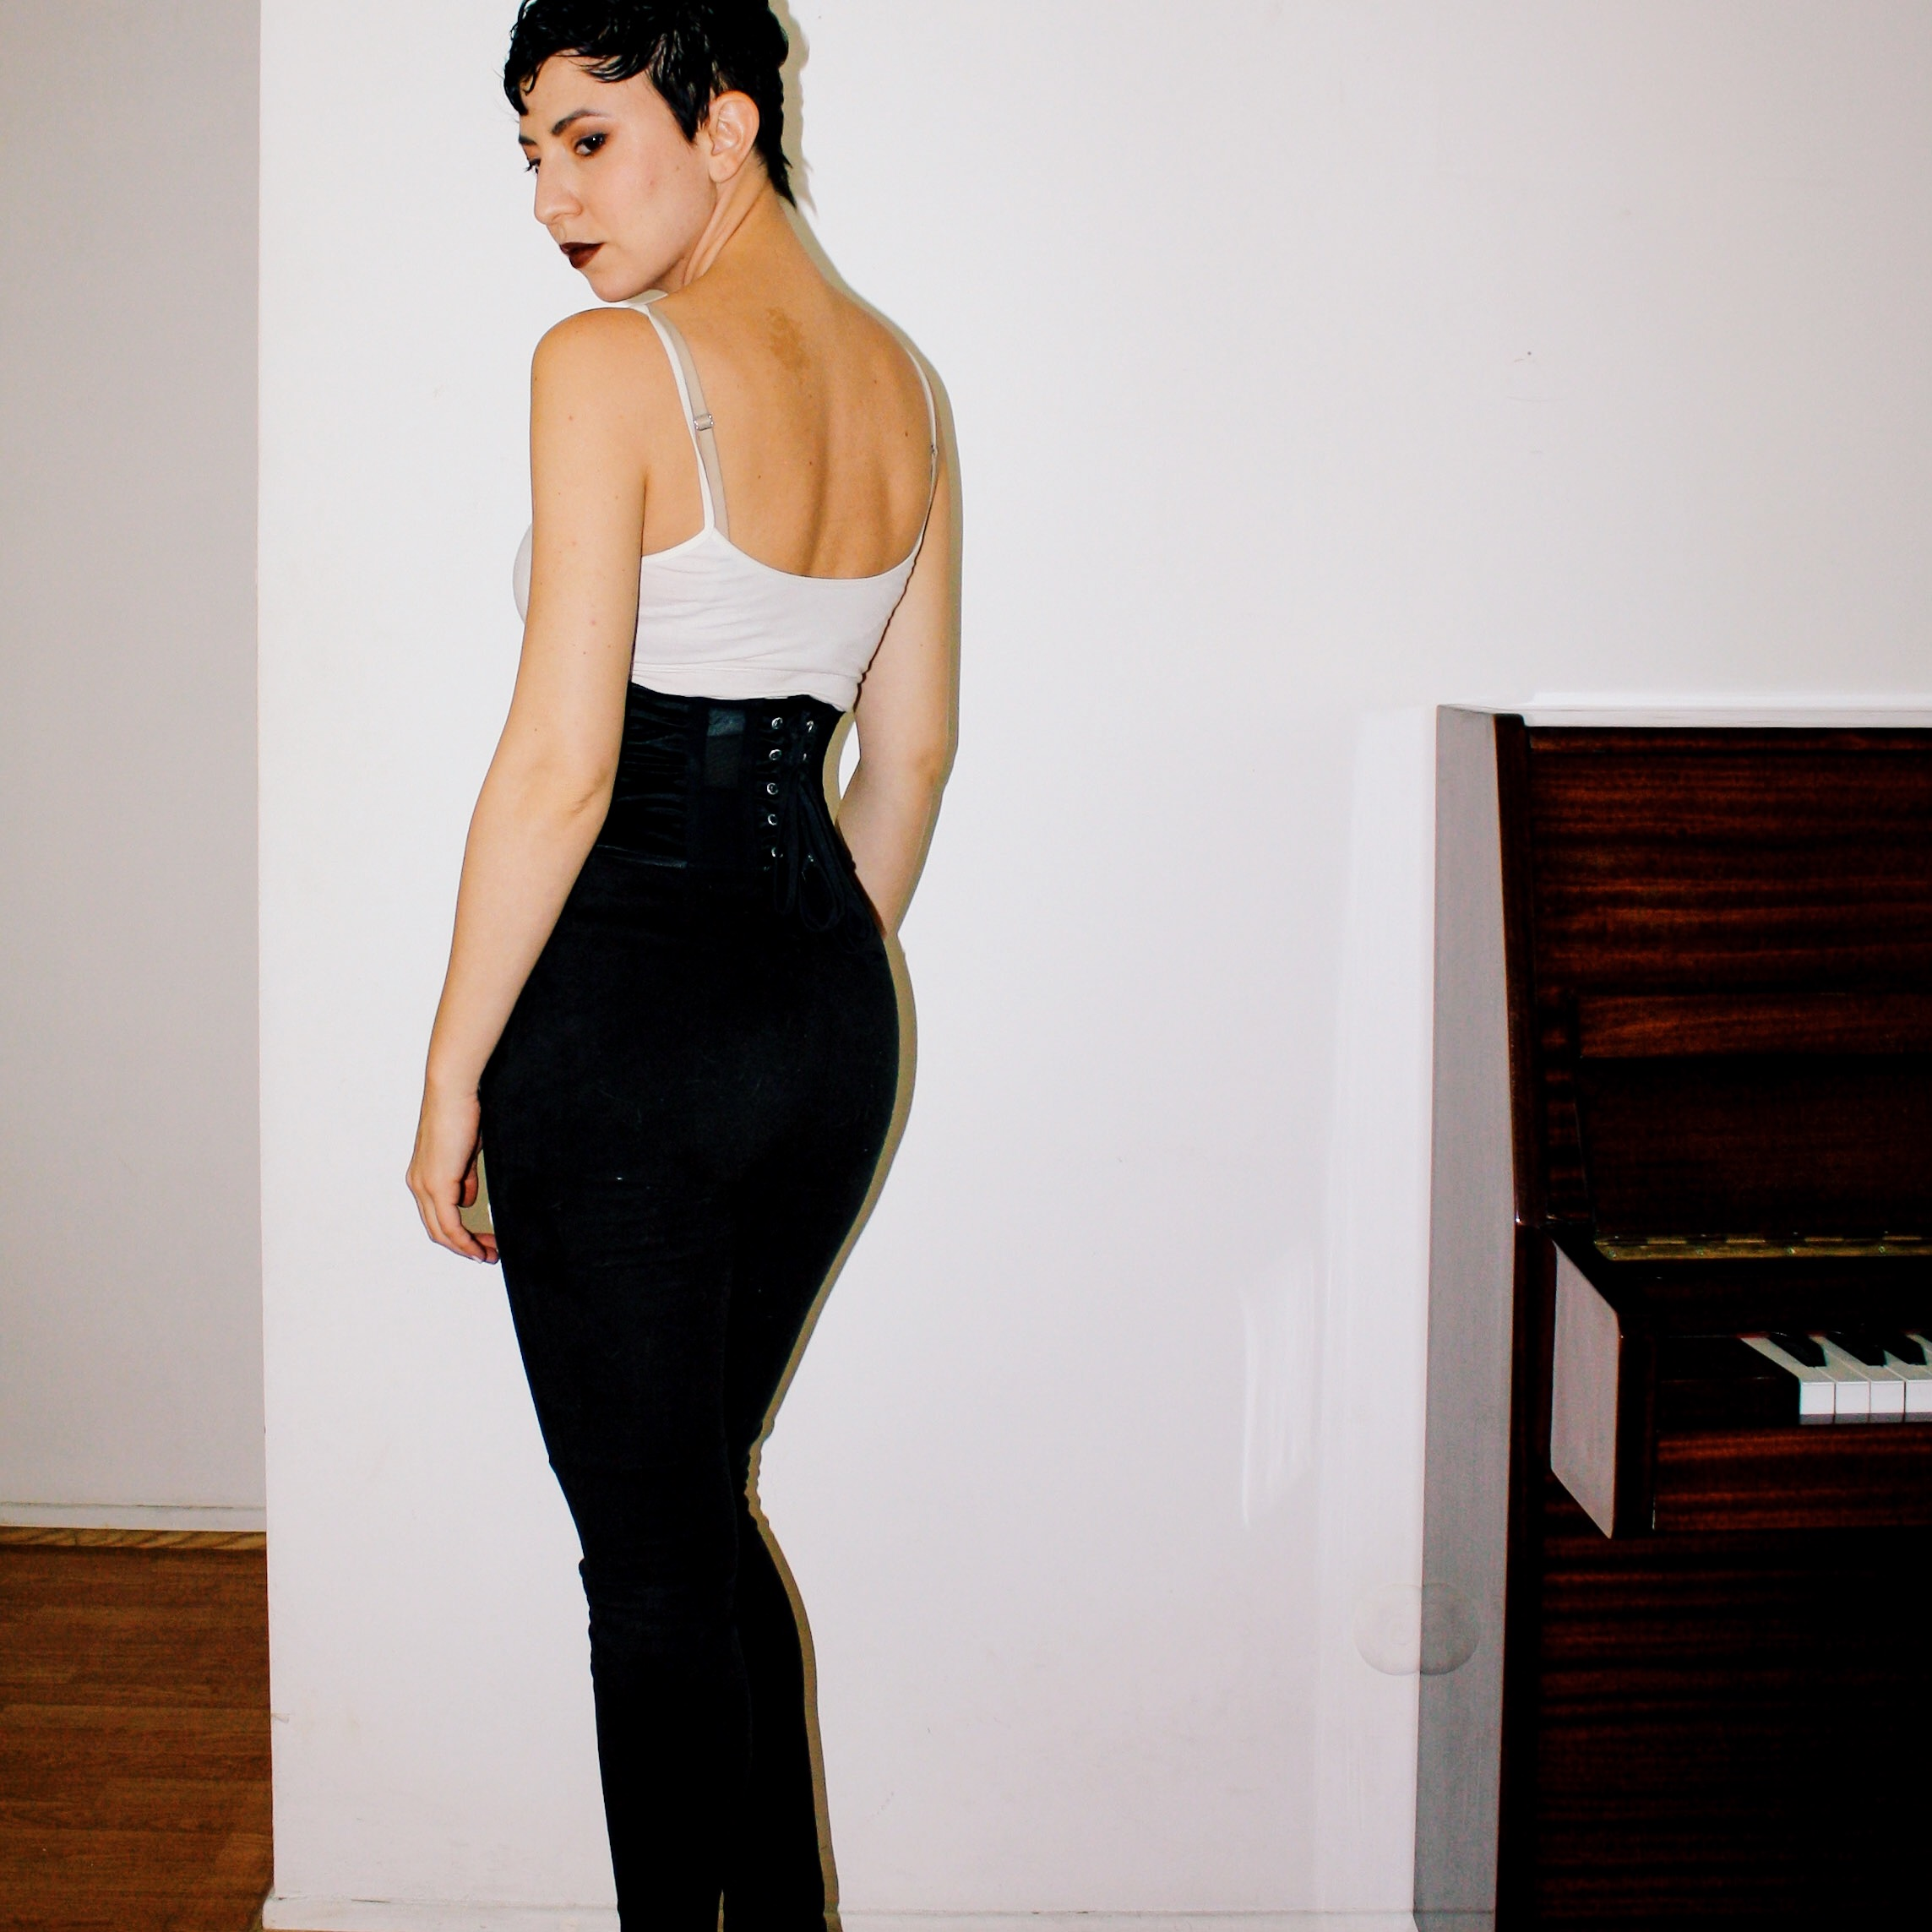 casual outfits manolo blahnik patent leather heels shoes suede pants piano white tank fur stole jacket corset belt 5